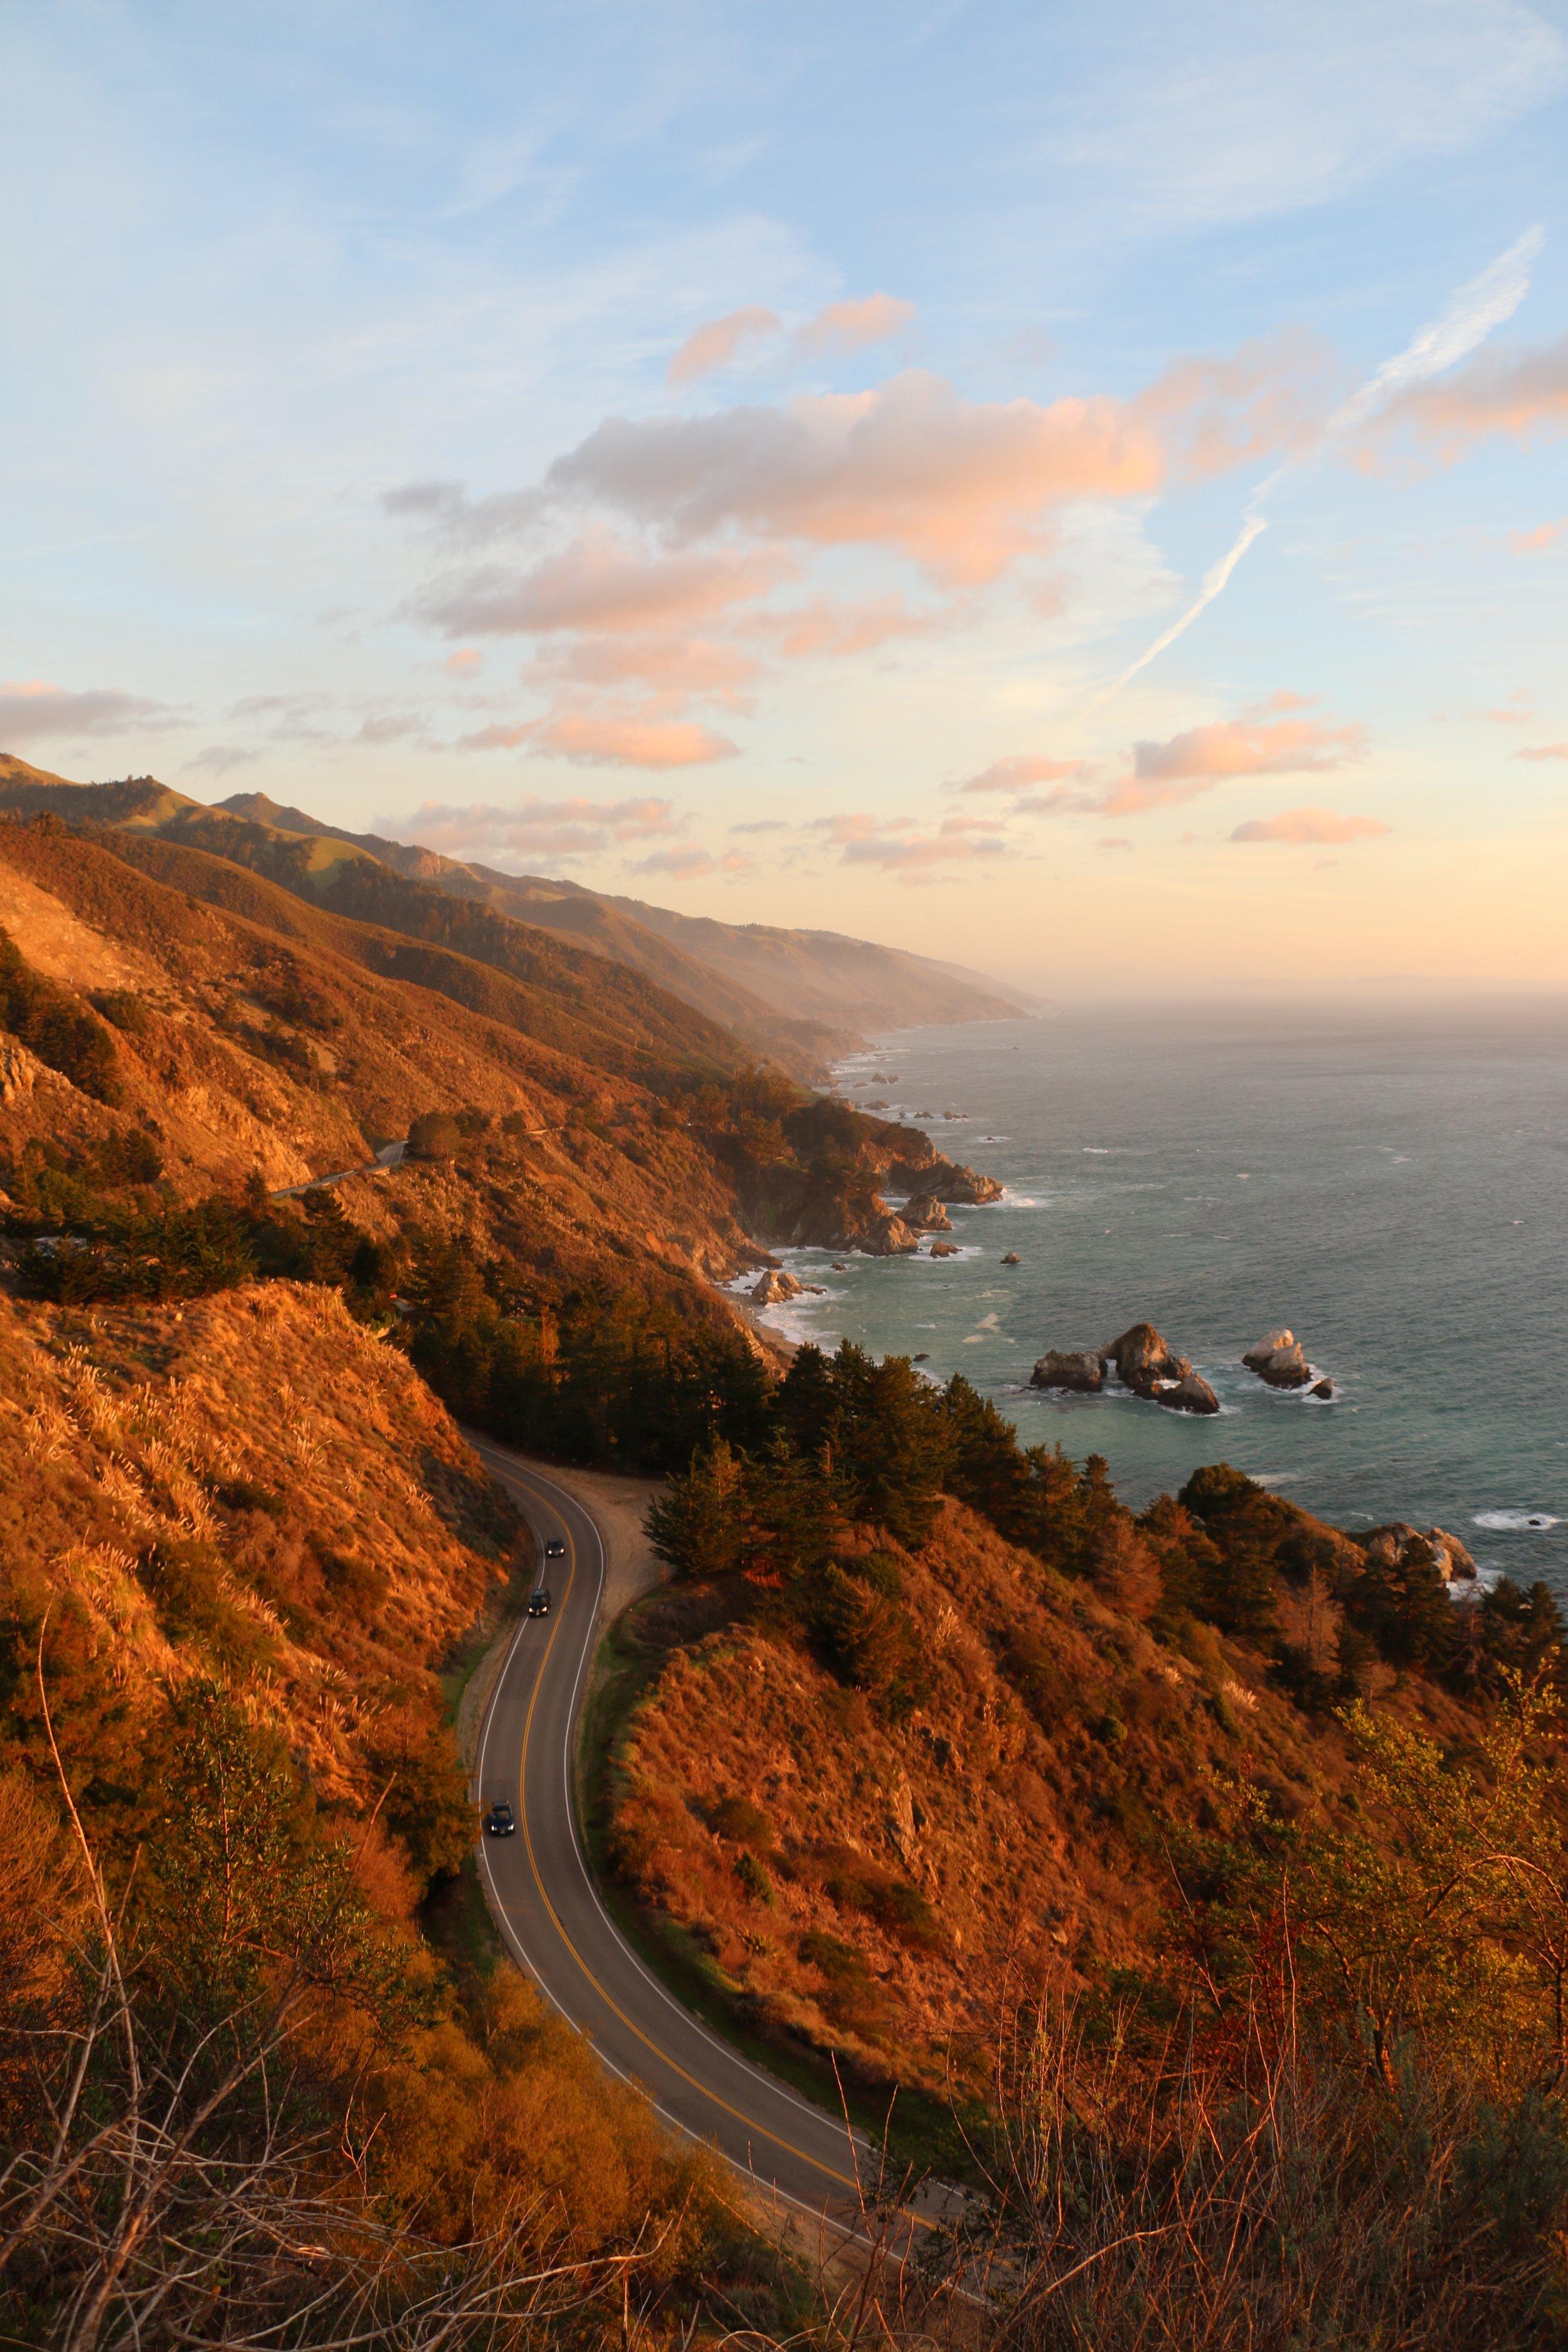 winding mountain highway along the coast